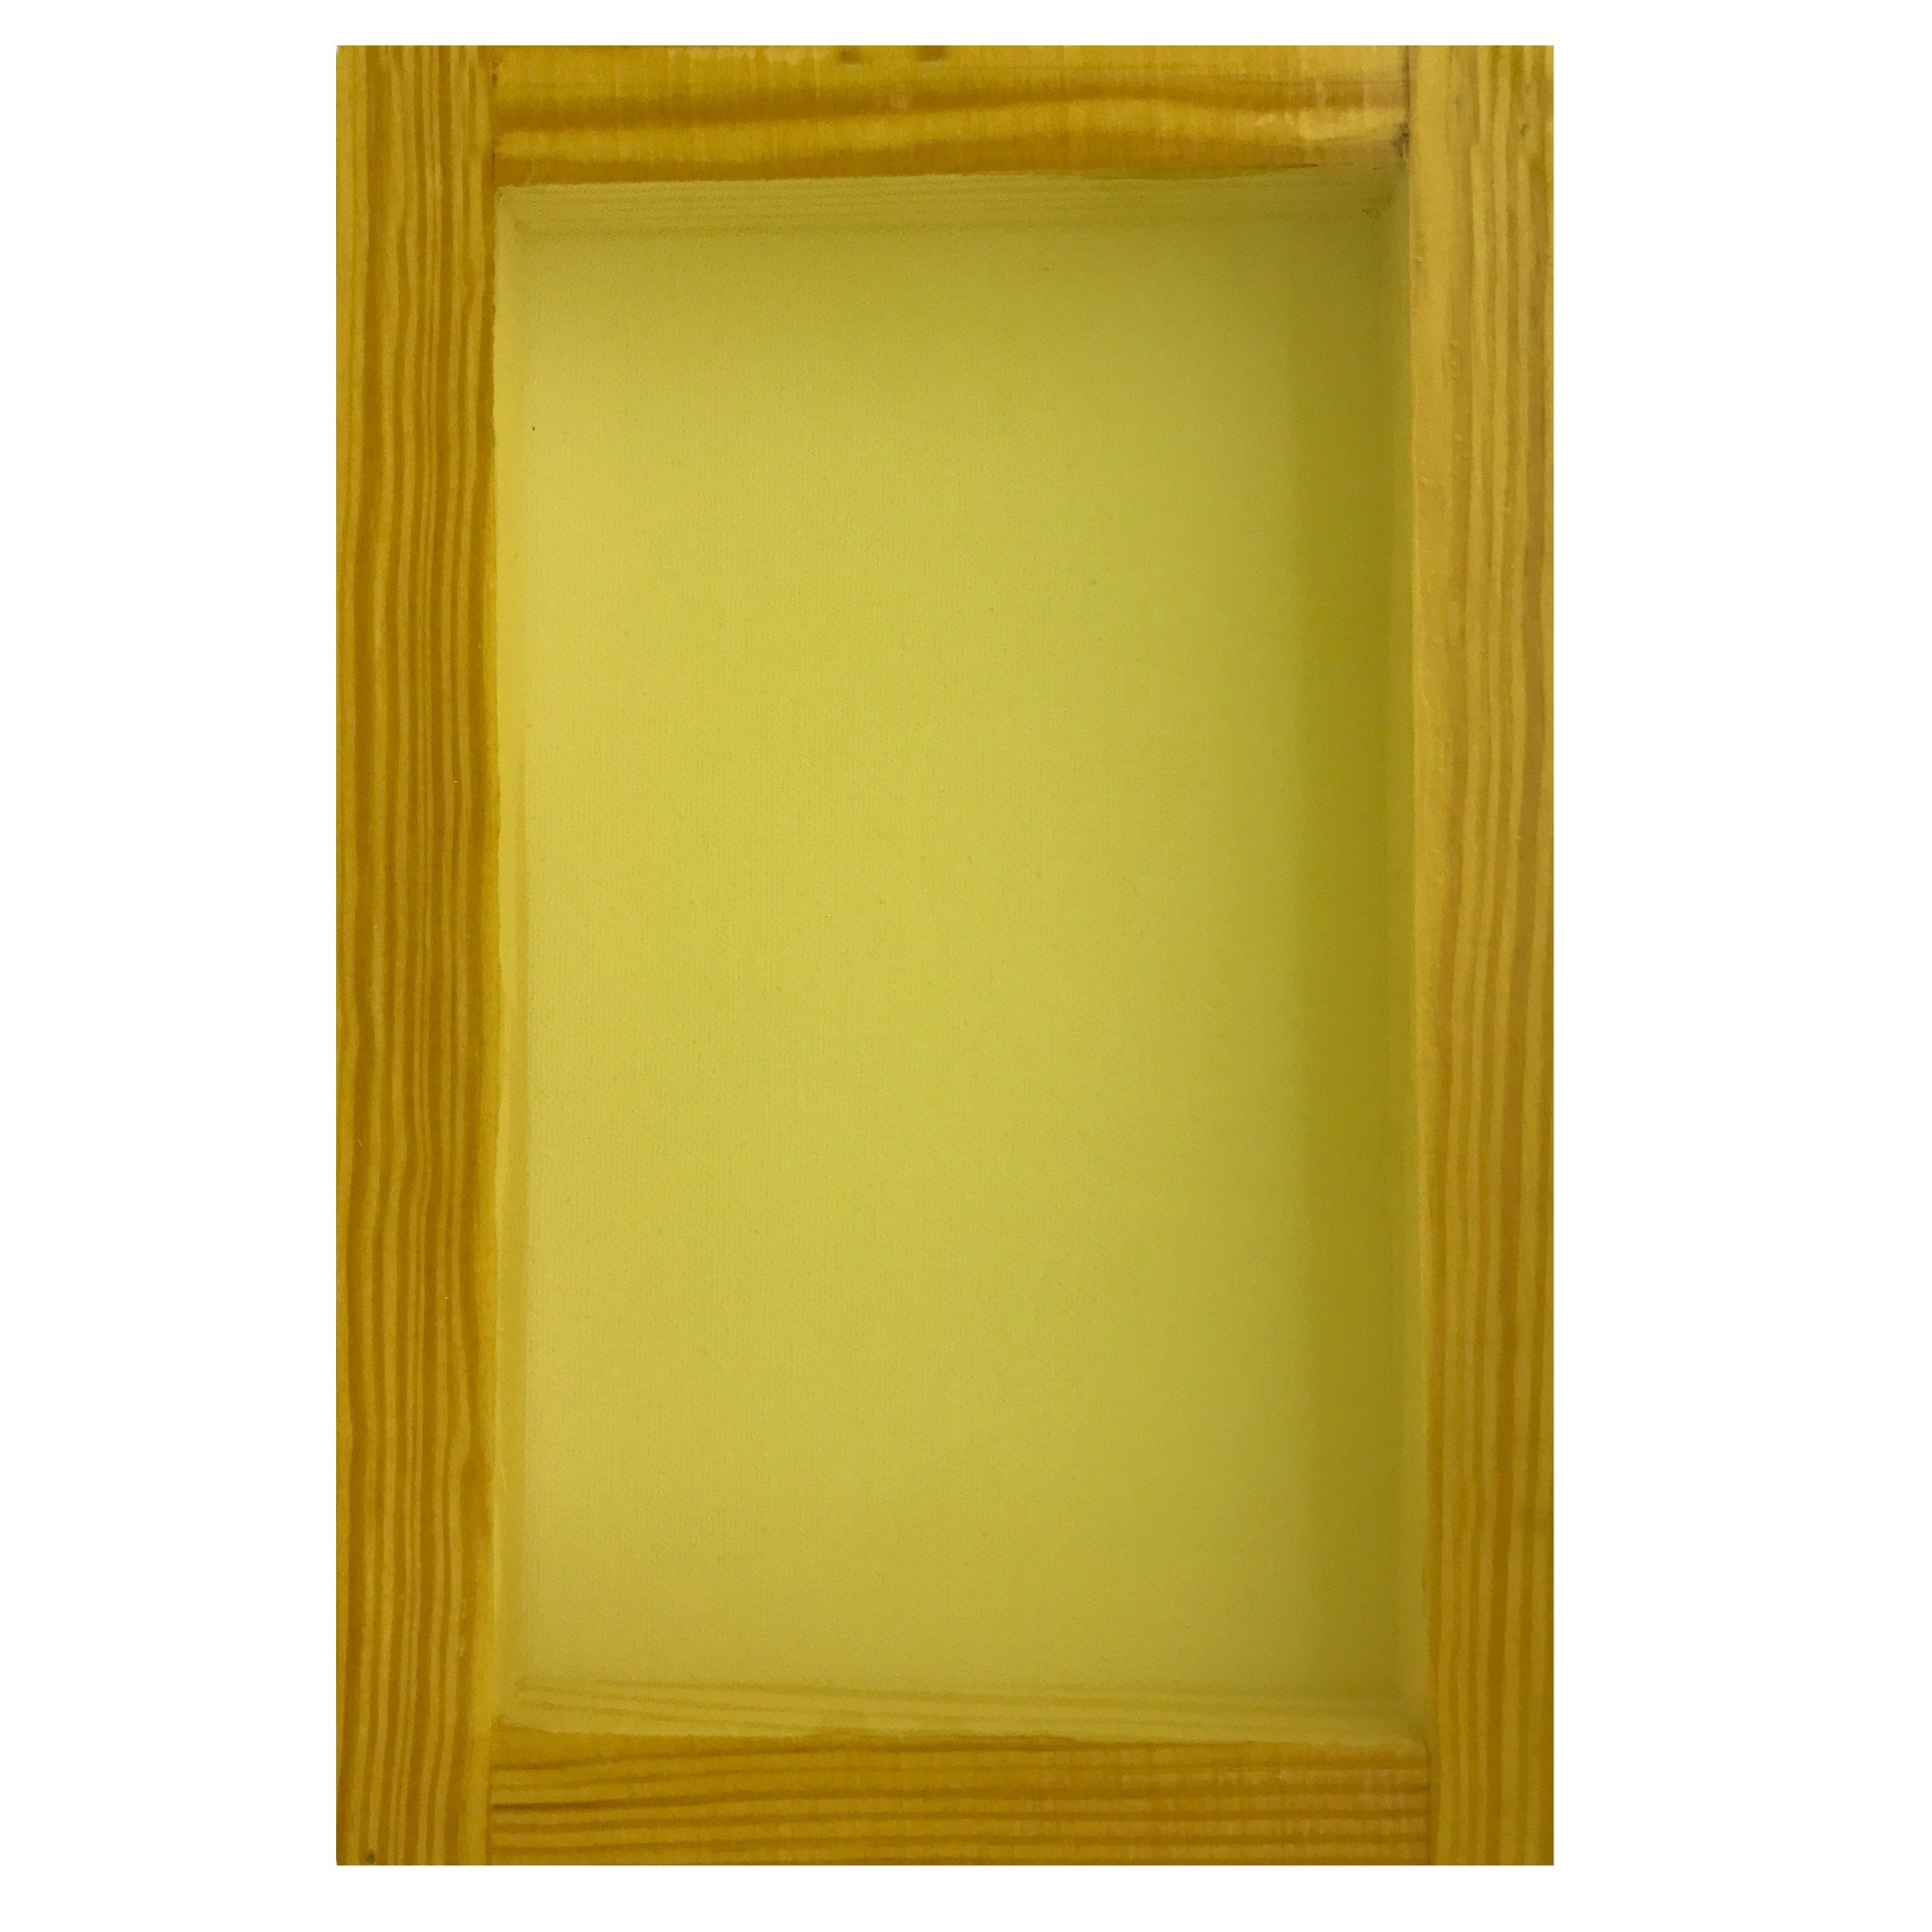 SILK SCREEN FRAME for SCREEN PRINTING (8x12'') 230 mesh White or Yellow by Sunbelt Mfg. Co